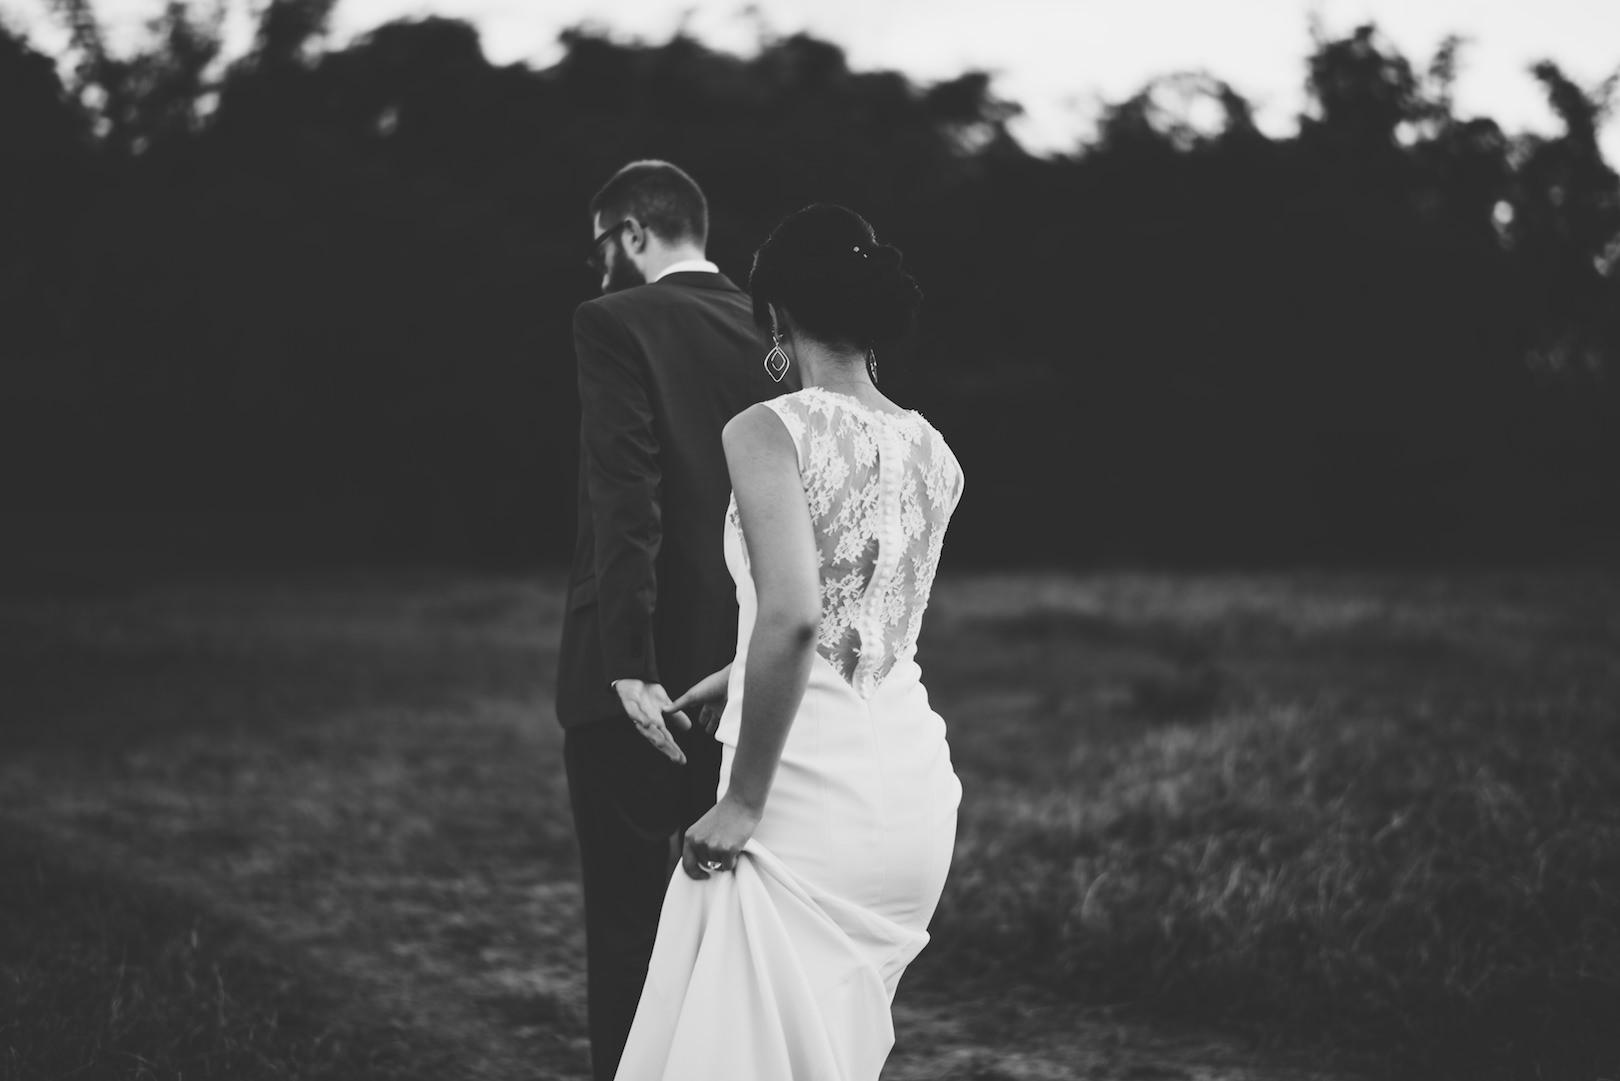 Nathan & Felicia - Wedding Day - © Dallas Kolotylo Photography - 575